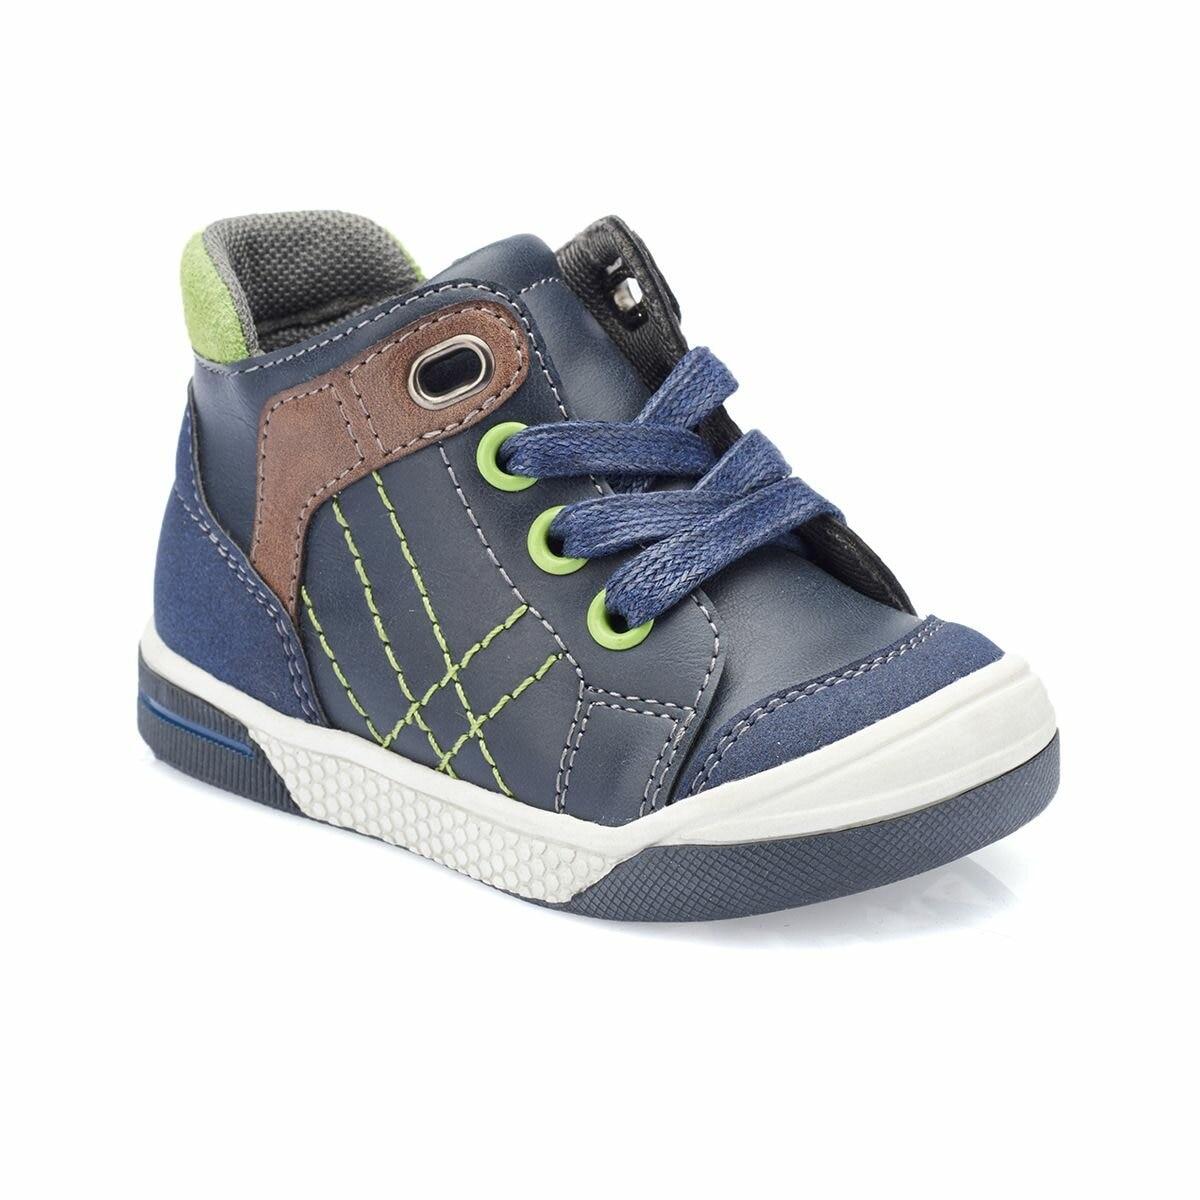 FLO 82.510792.I Navy Blue Male Child Boots Polaris